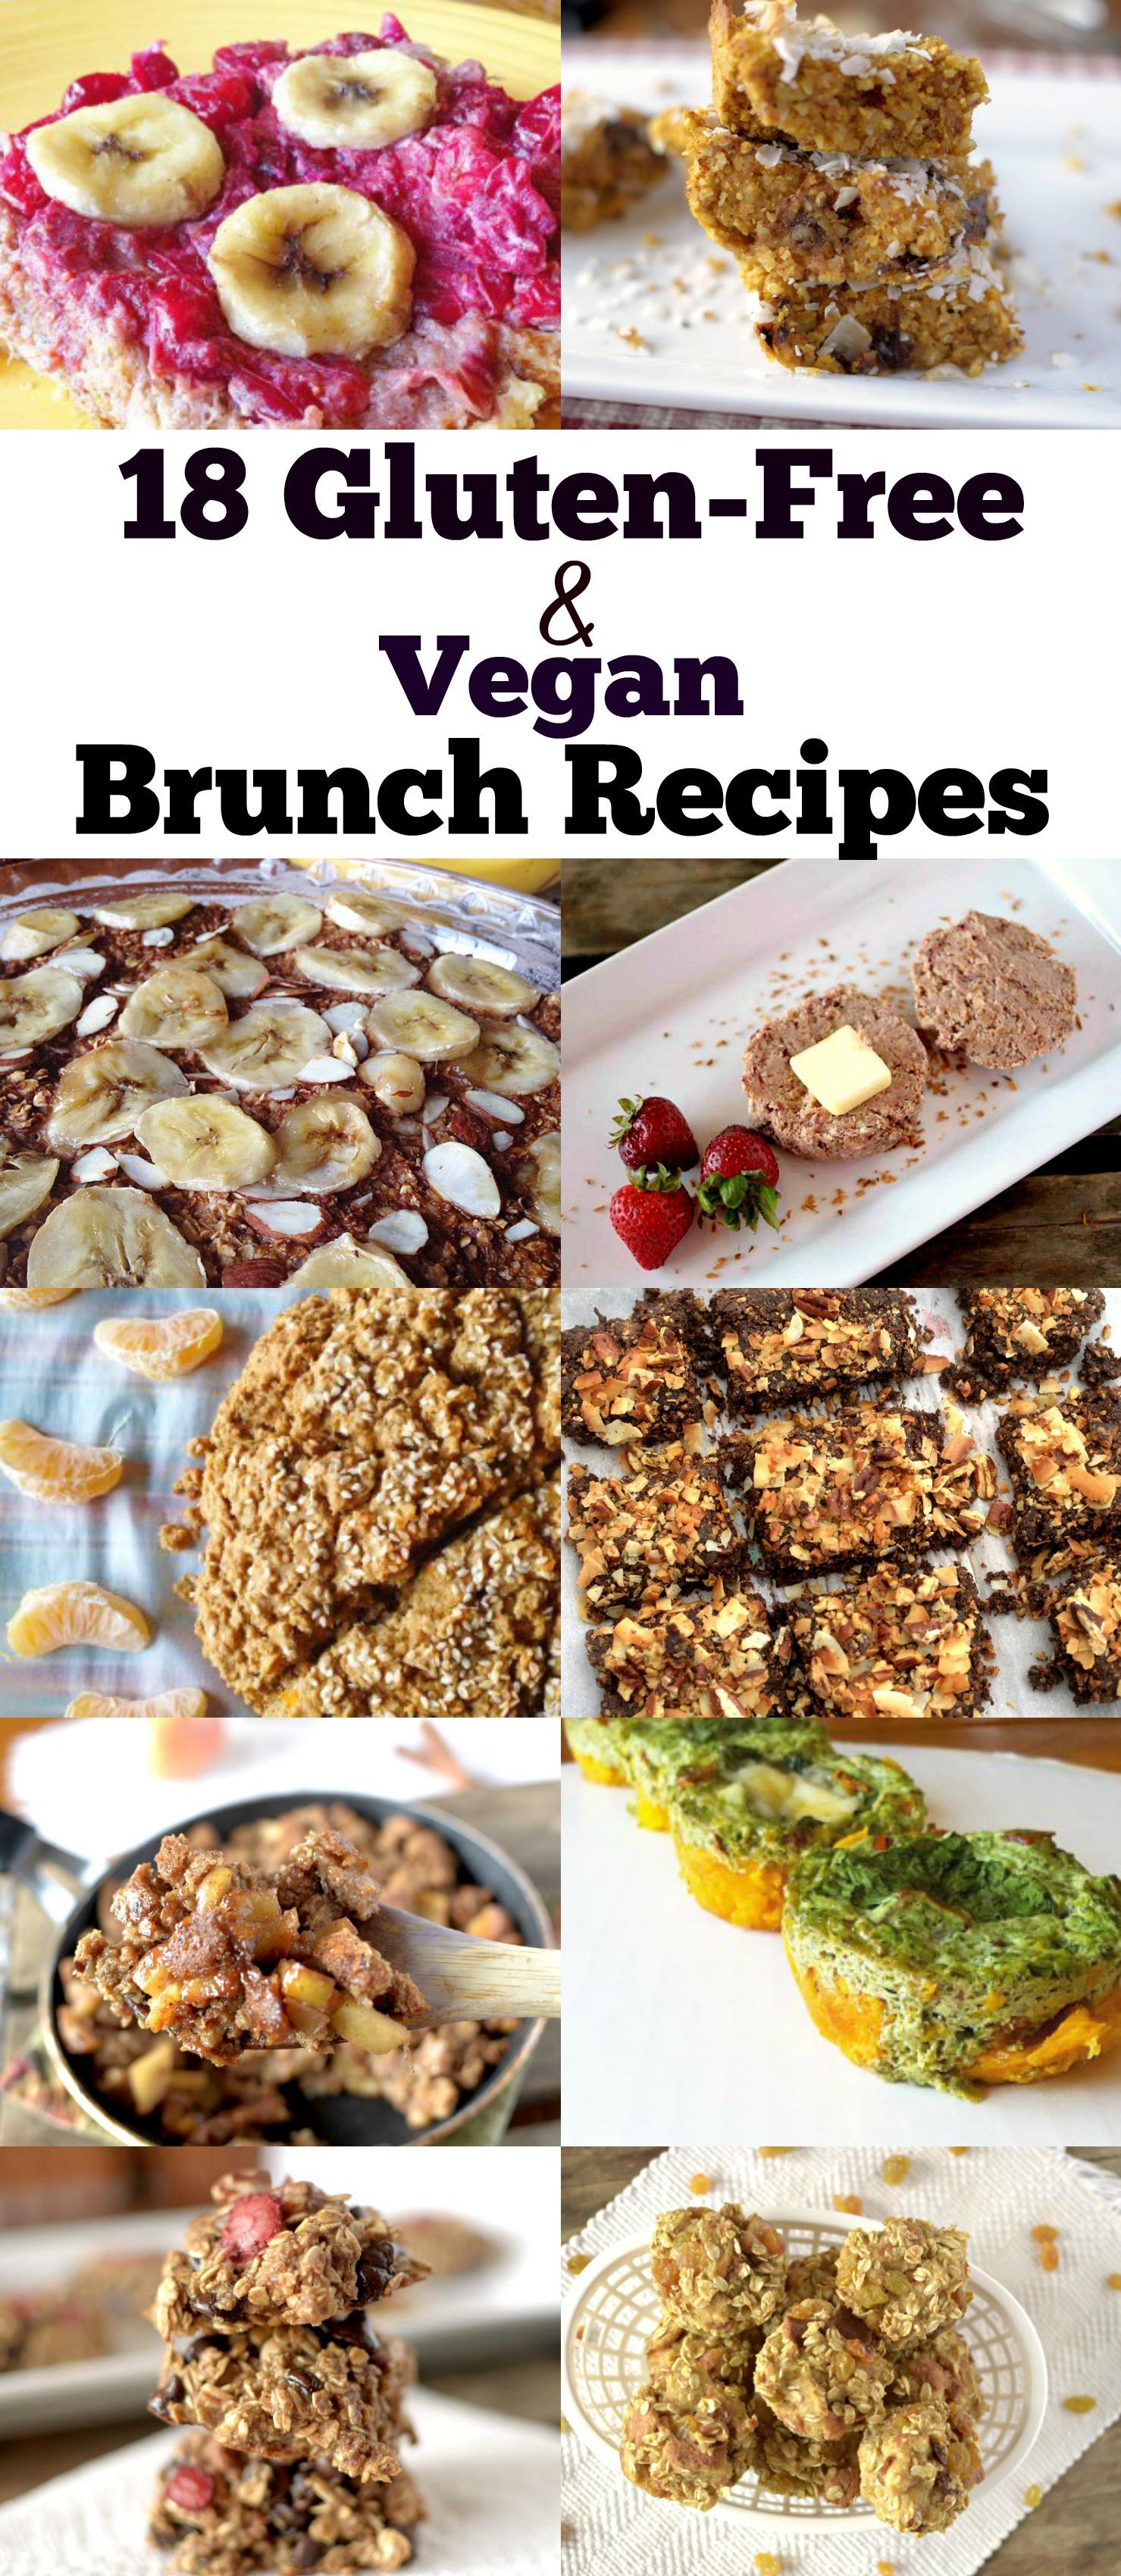 Gluten Free Brunch Recipes  18 Gluten Free and Vegan Brunch Recipes Clean and